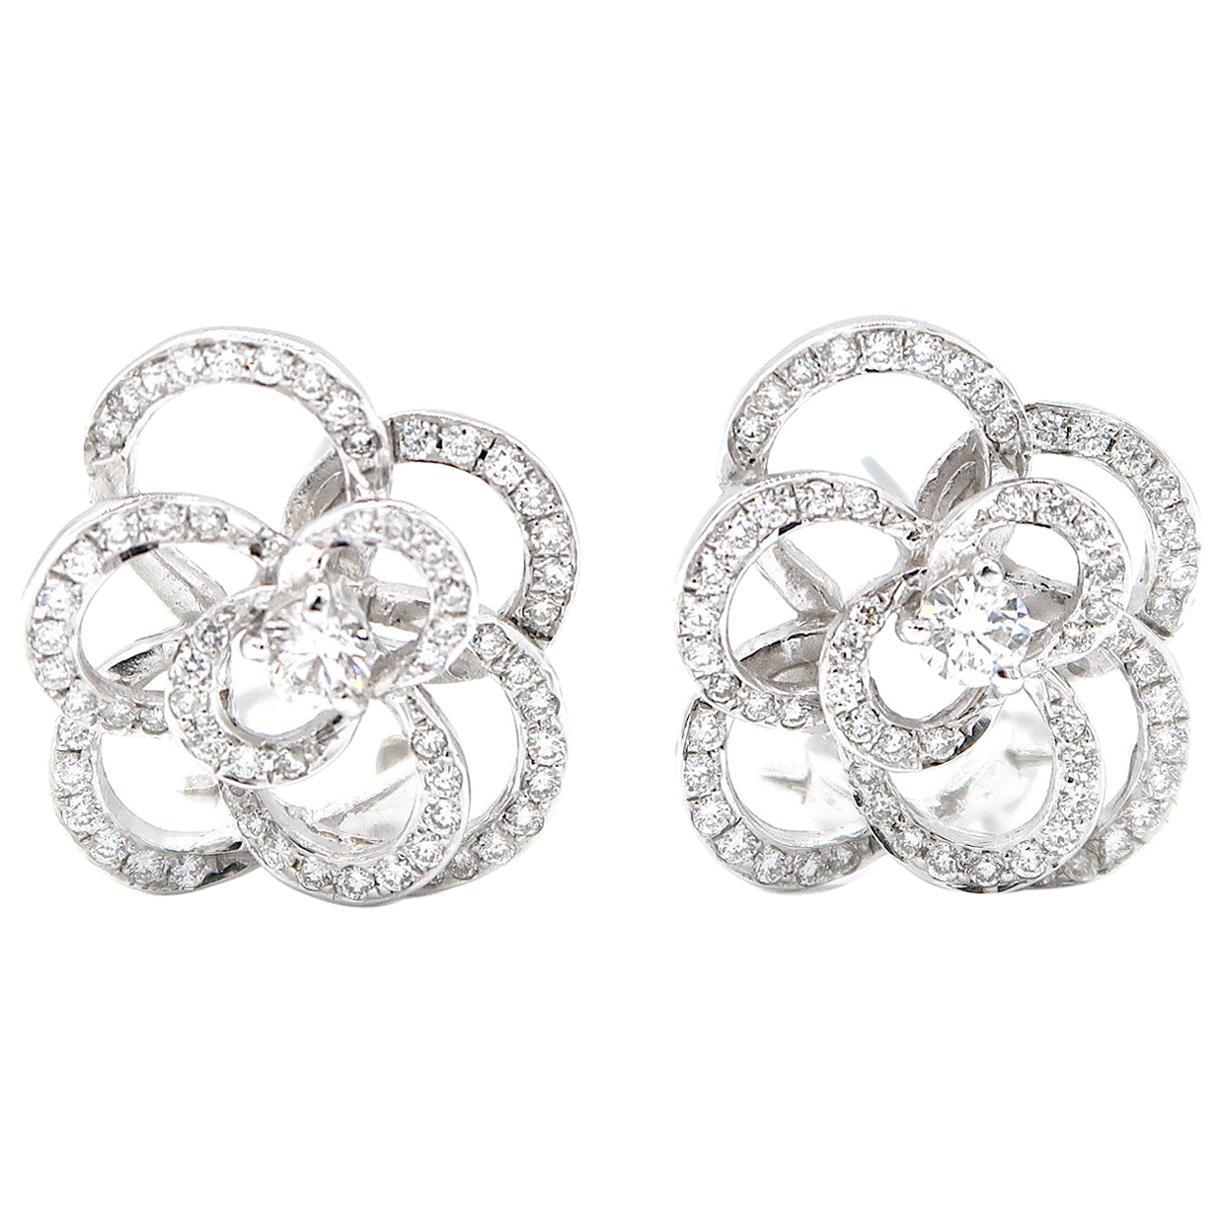 Medium Floral Silhouette Diamond Clip-On Earrings in 18 Karat White Gold